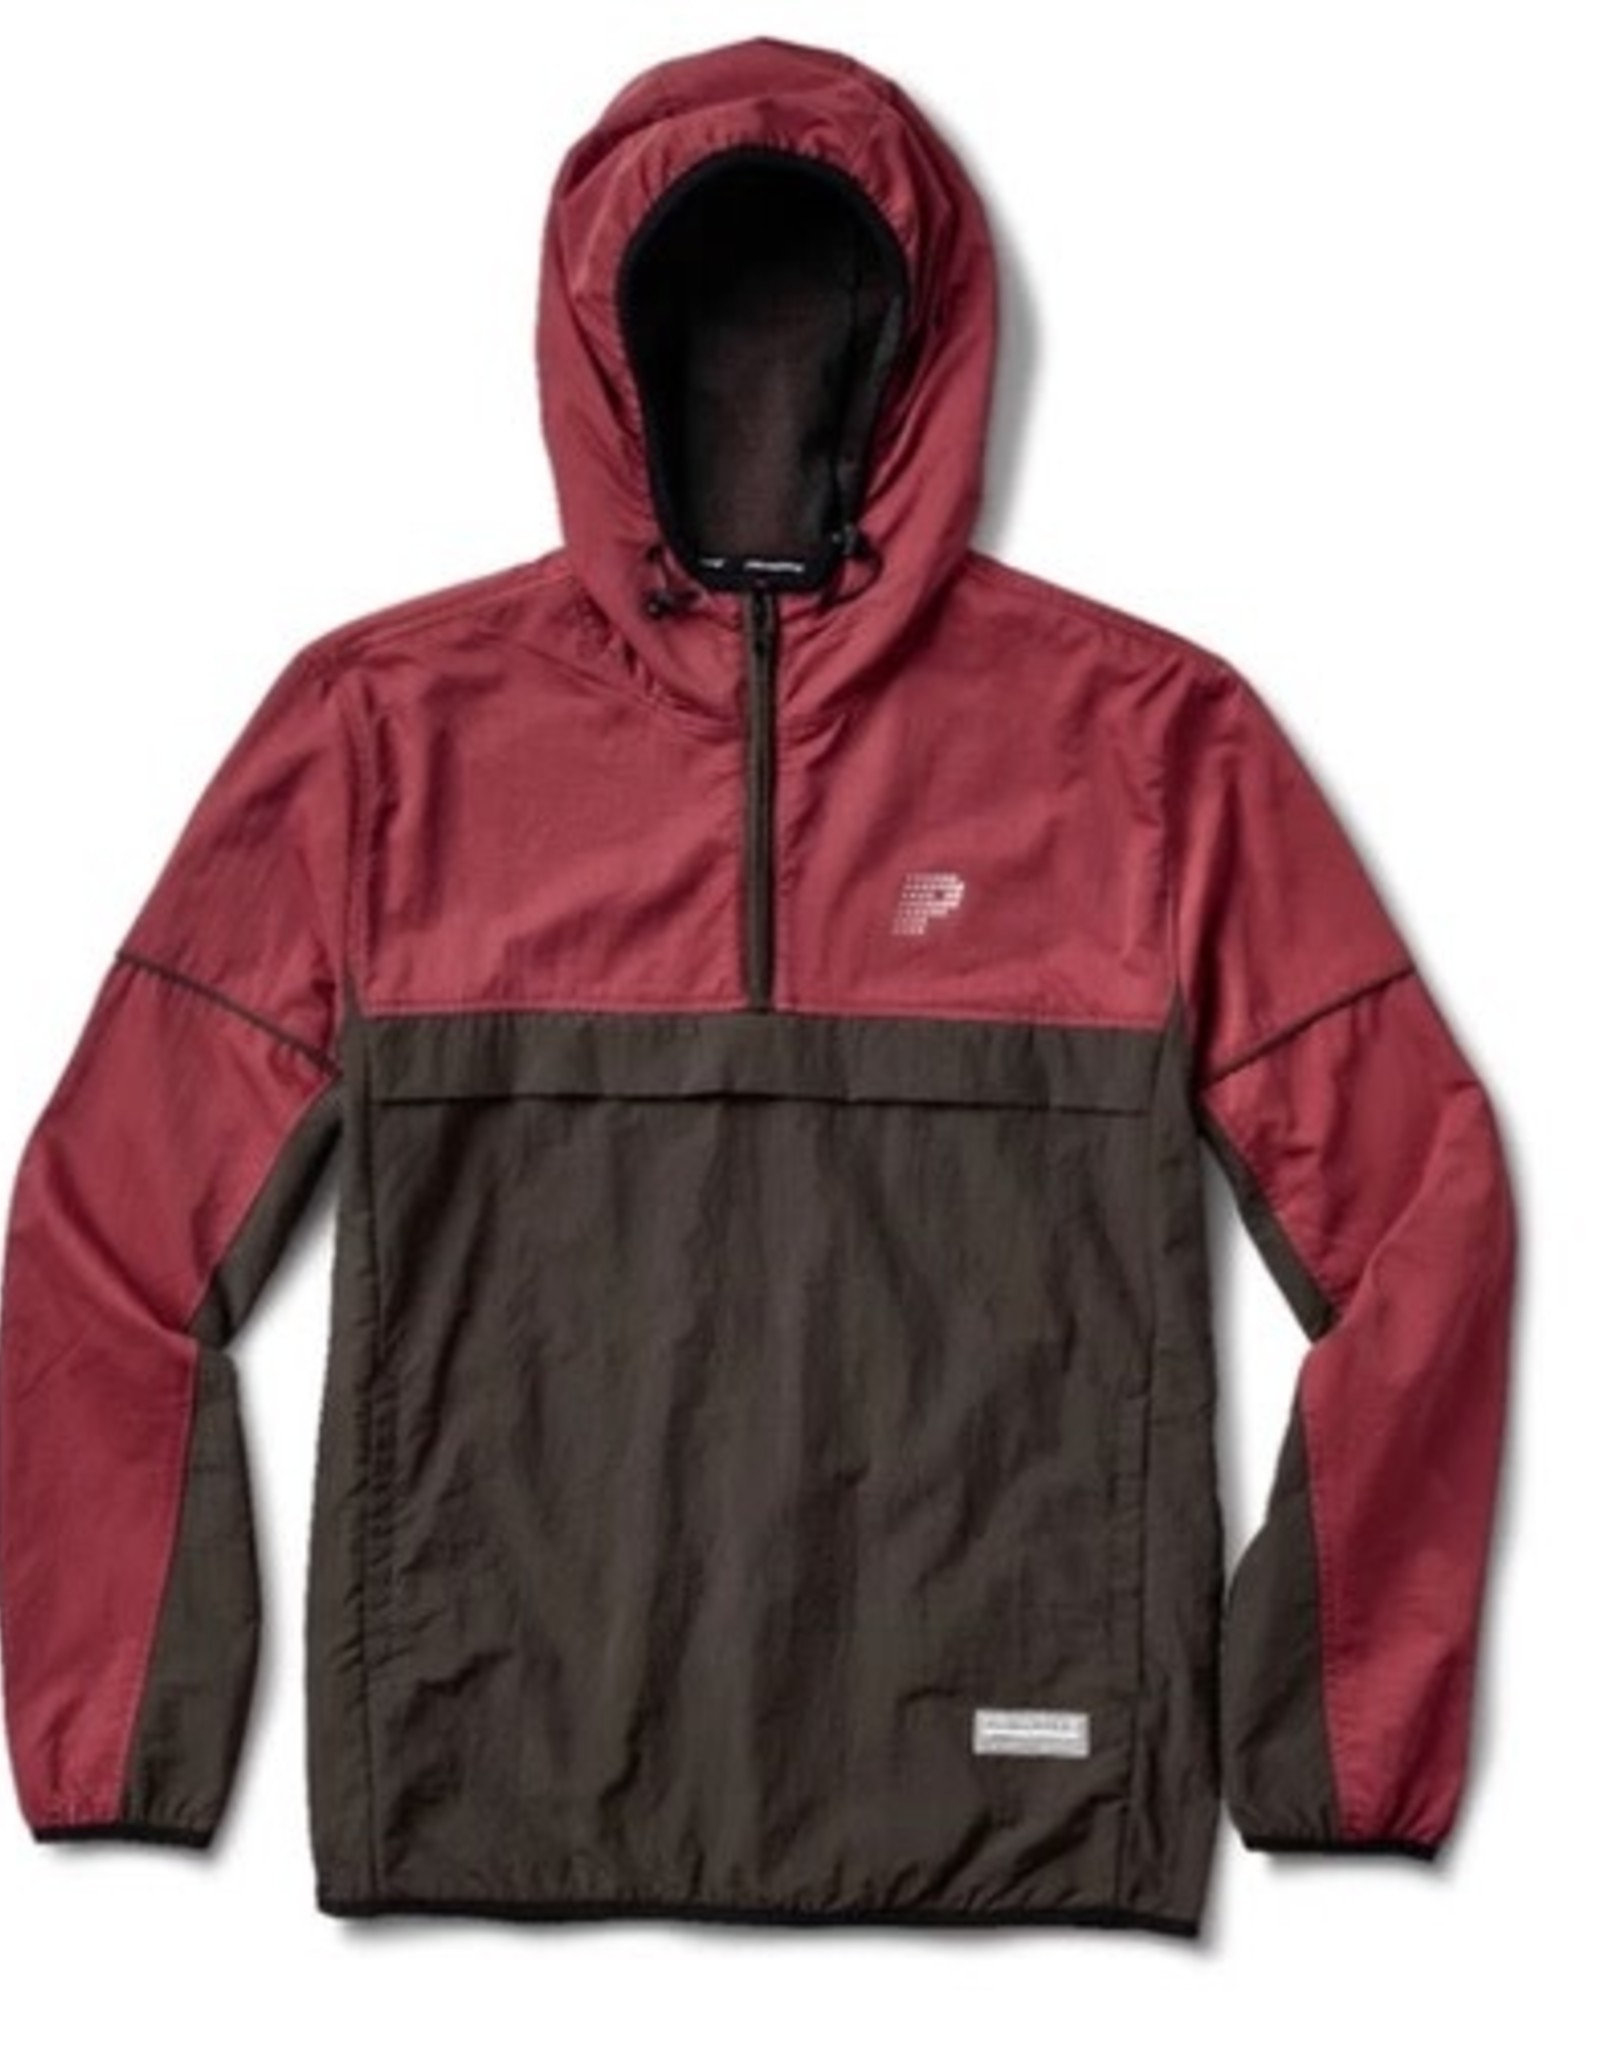 Primitive Wilshire Jacket